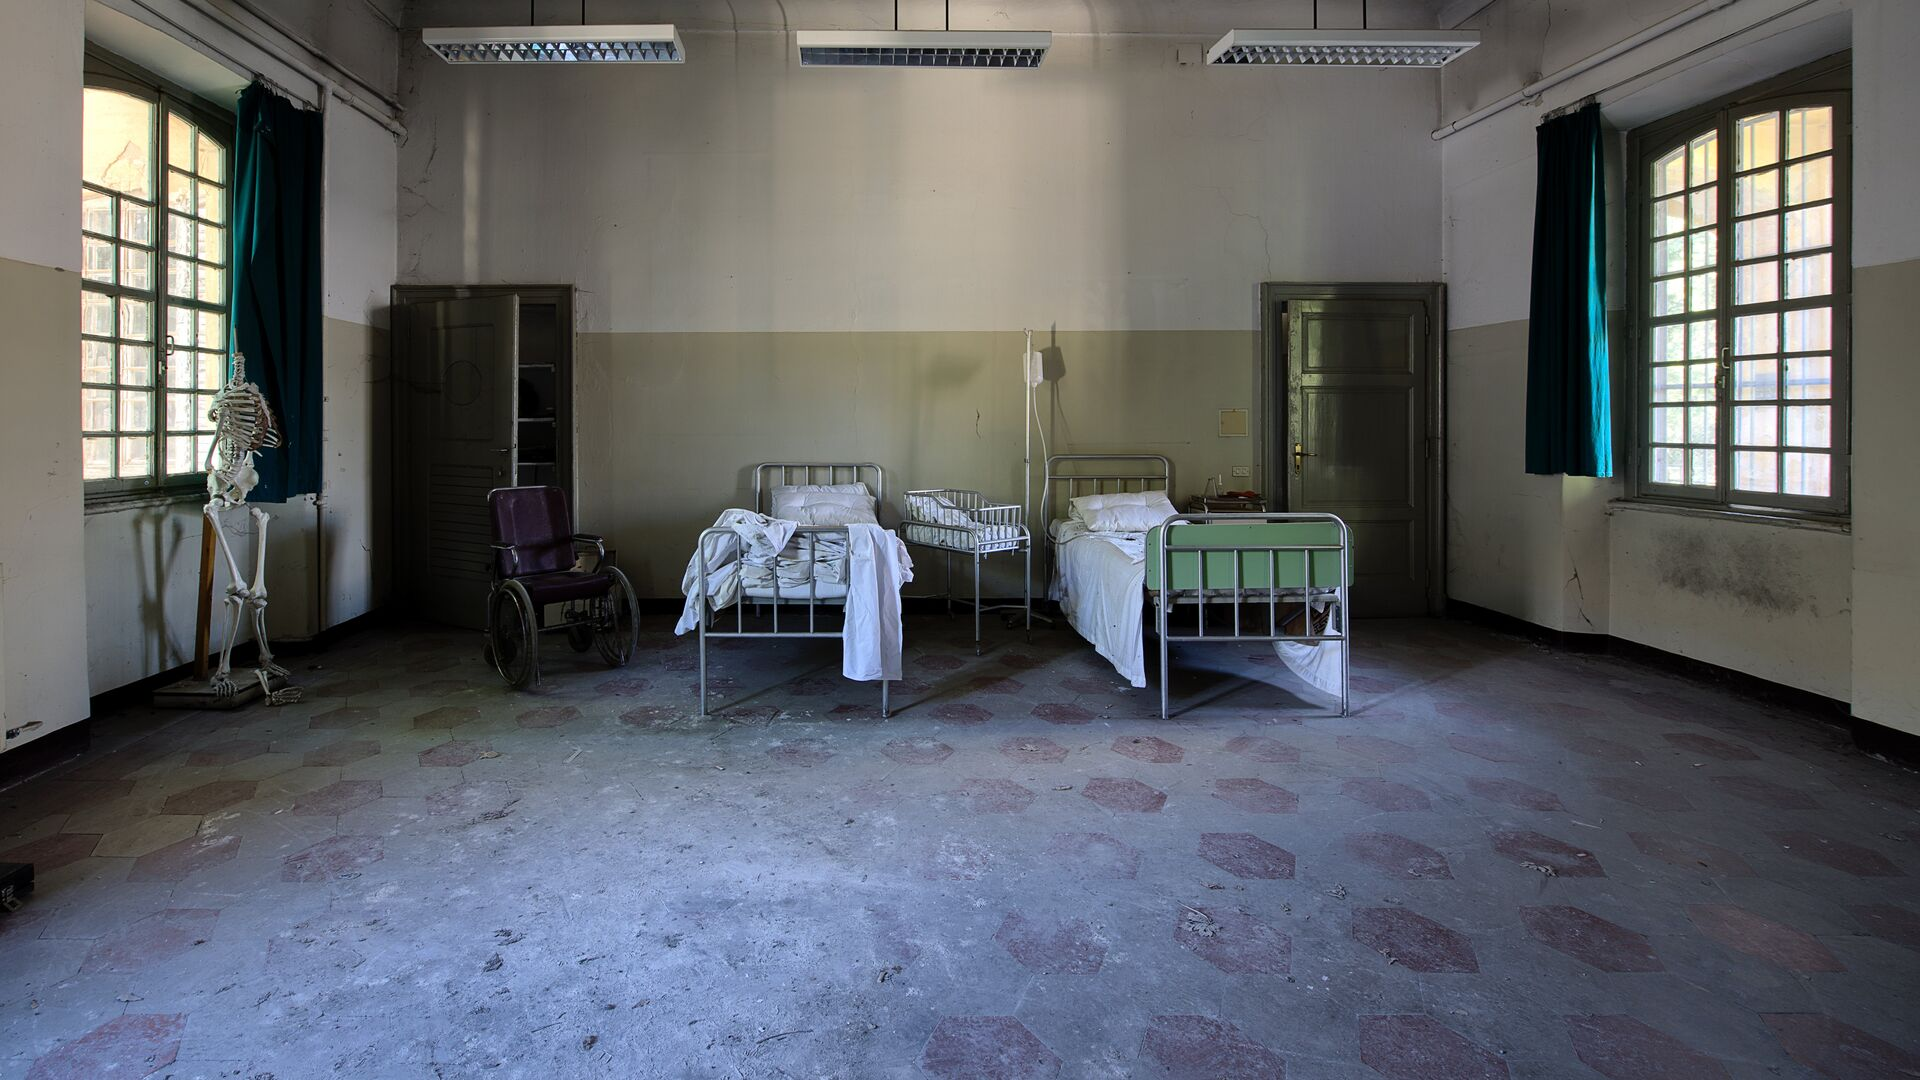 Un hospital (imagen referencial) - Sputnik Mundo, 1920, 16.07.2021